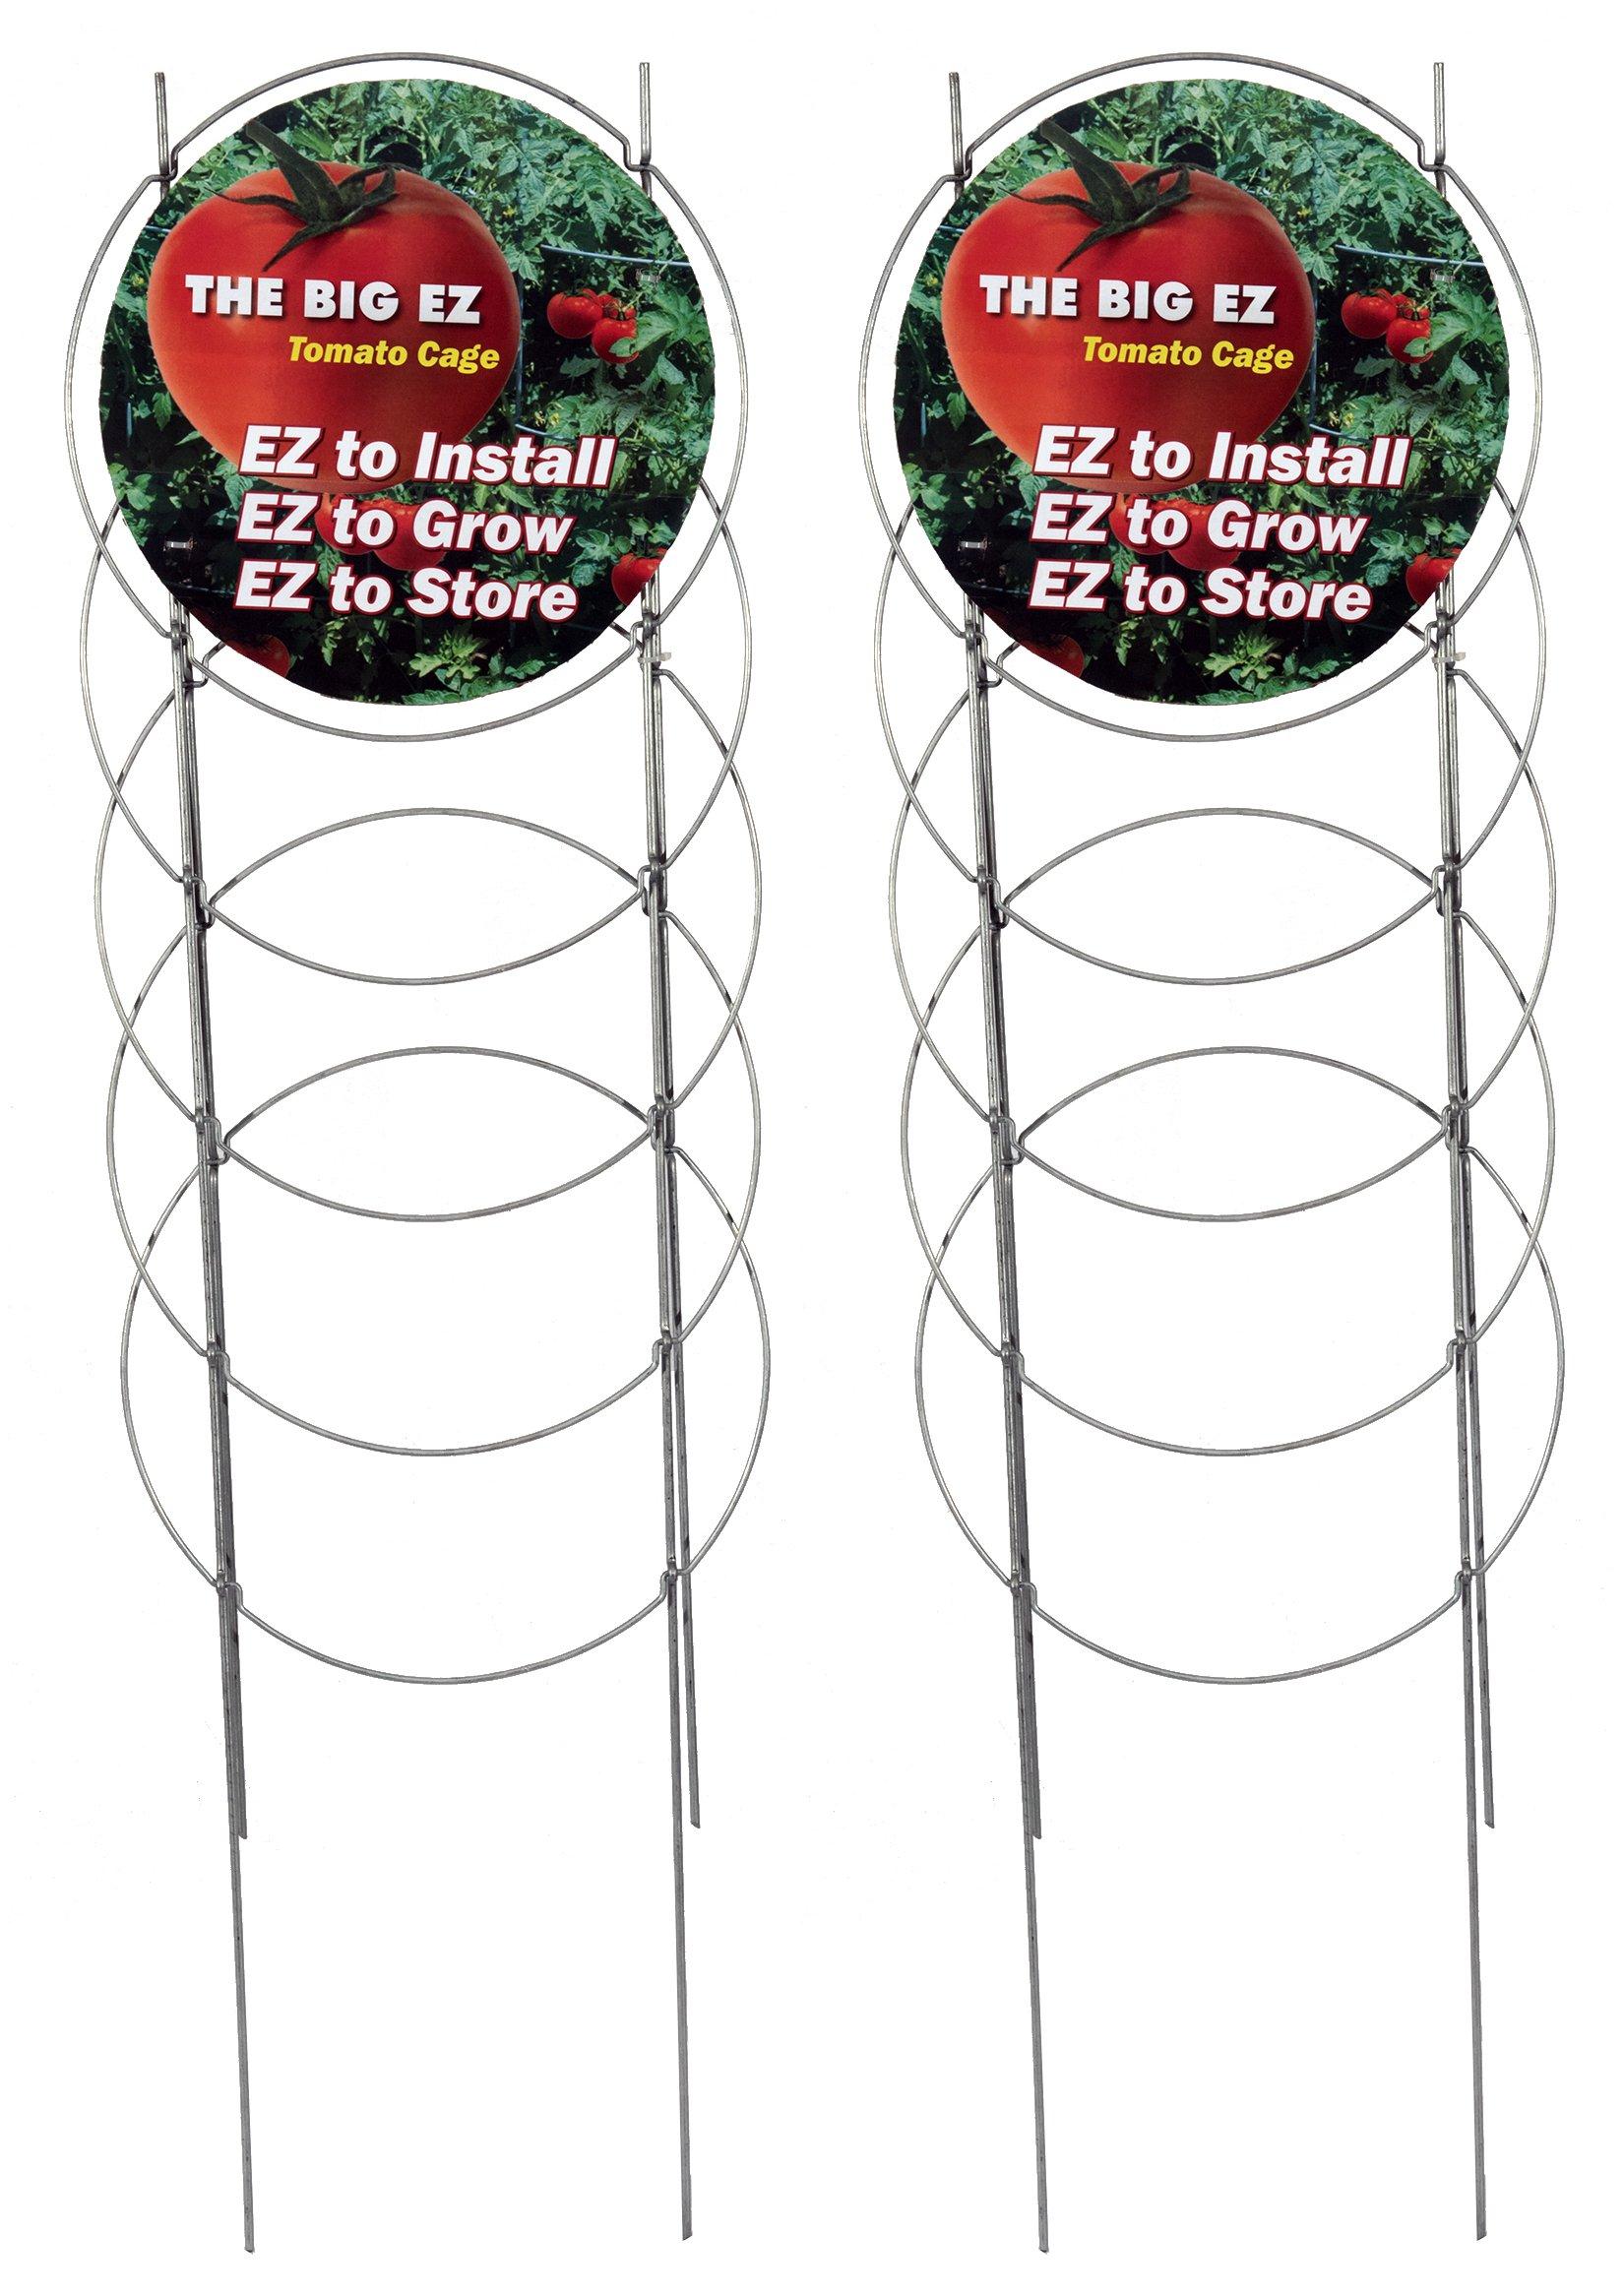 Dasco Pro Fiberglass Innovations EZ Grow TC-4 The Big EZ Heavy Duty Folding Tomato Cage and Plant Support, 2 Pack, Galvanized